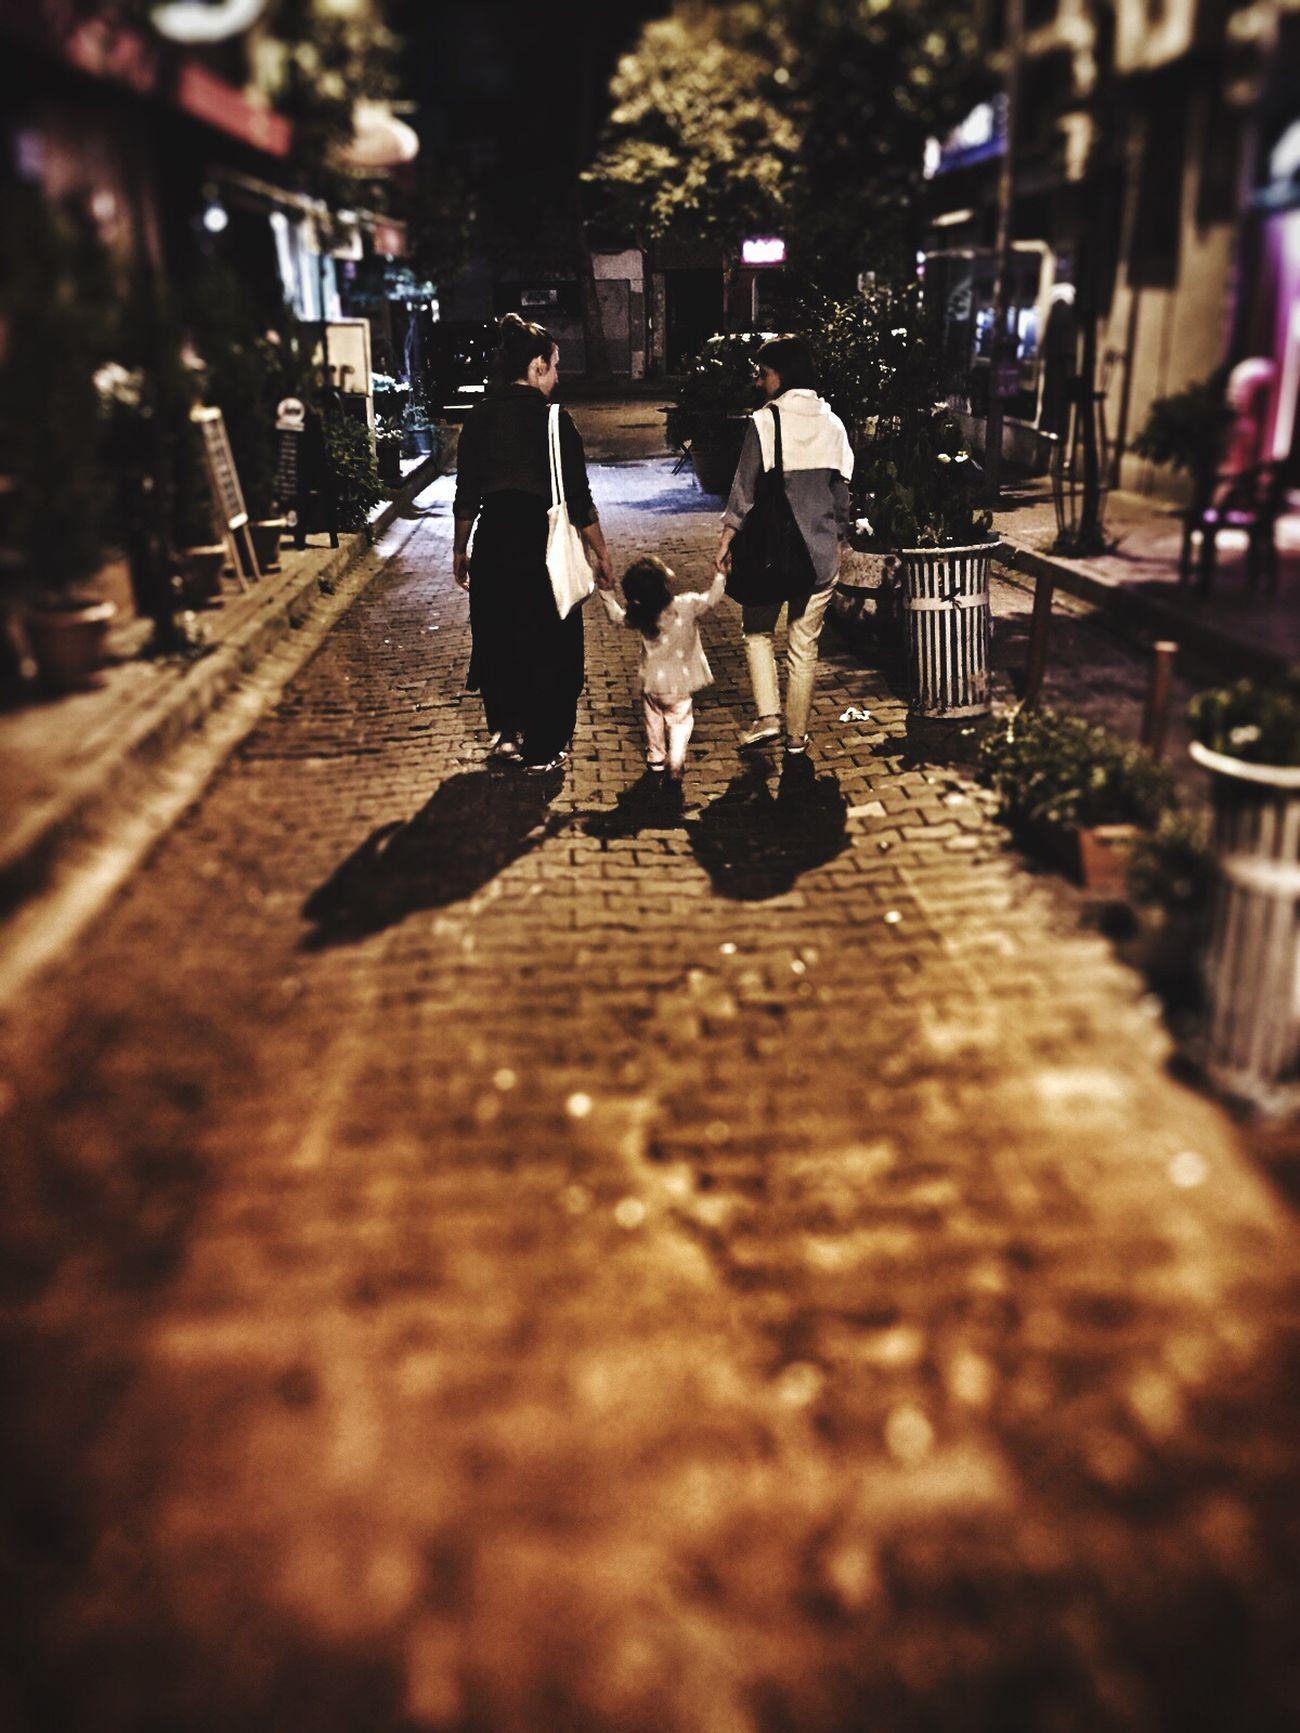 Night Lights My Lovely  Walking Around Taking Photos